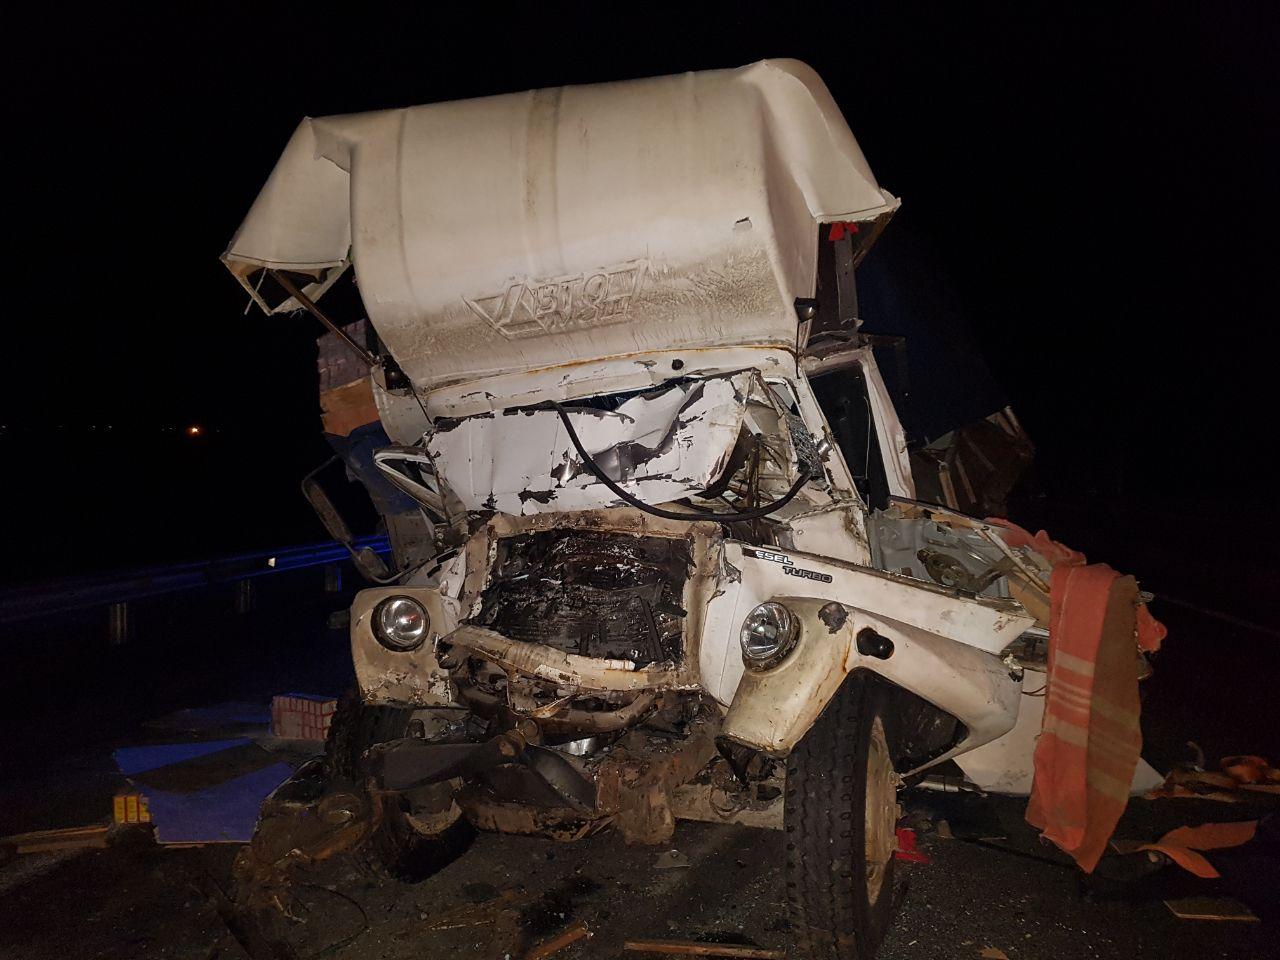 ВБашкирии натрассе столкнулись два грузового автомобиля: умер шофёр